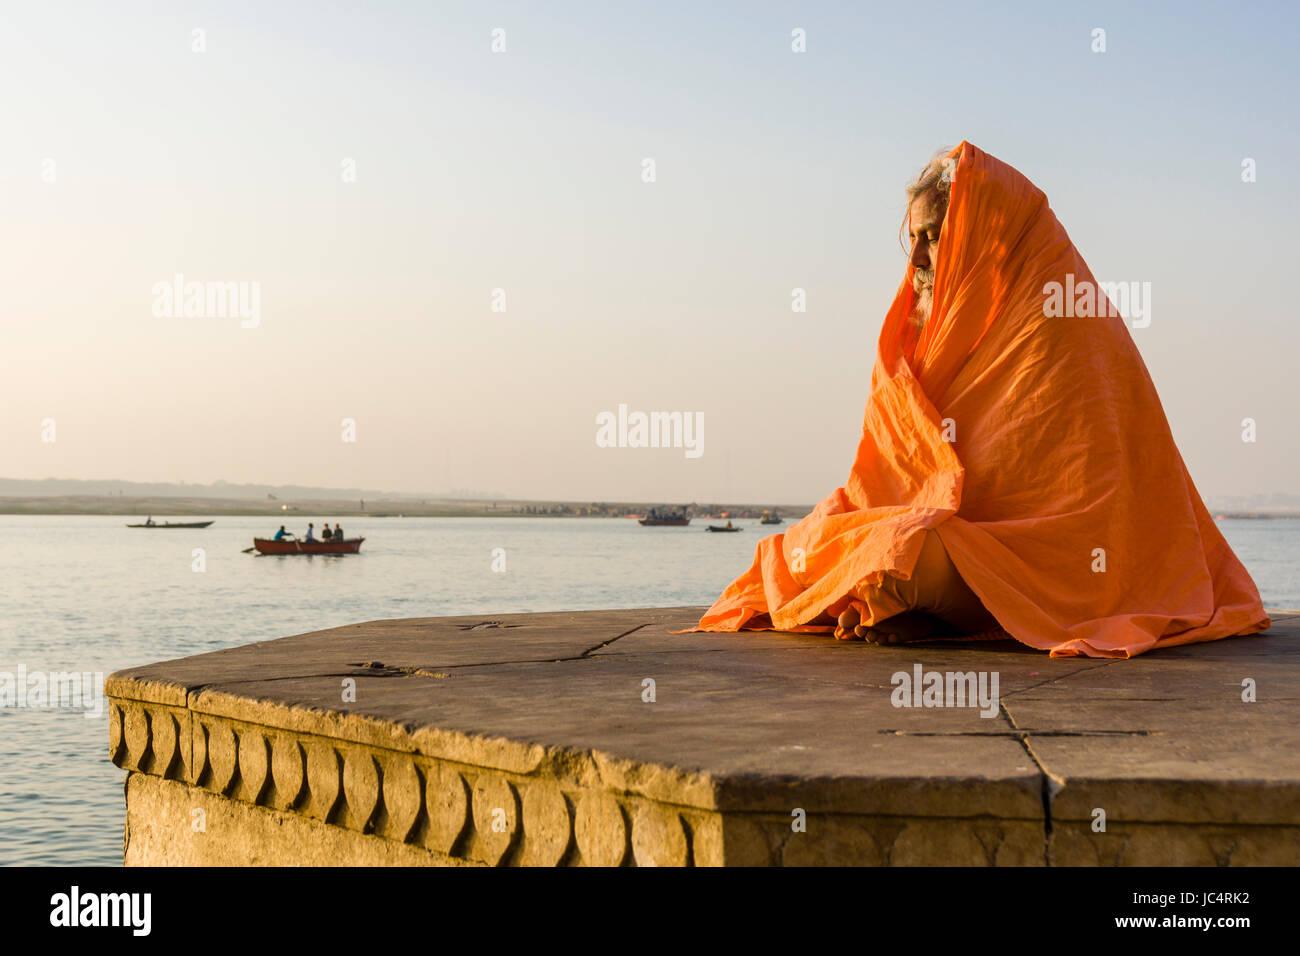 A Sadhu, holy man, is sitting and meditating on a platform at the holy river Ganges at Dashashwamedh Ghat, Main - Stock Image